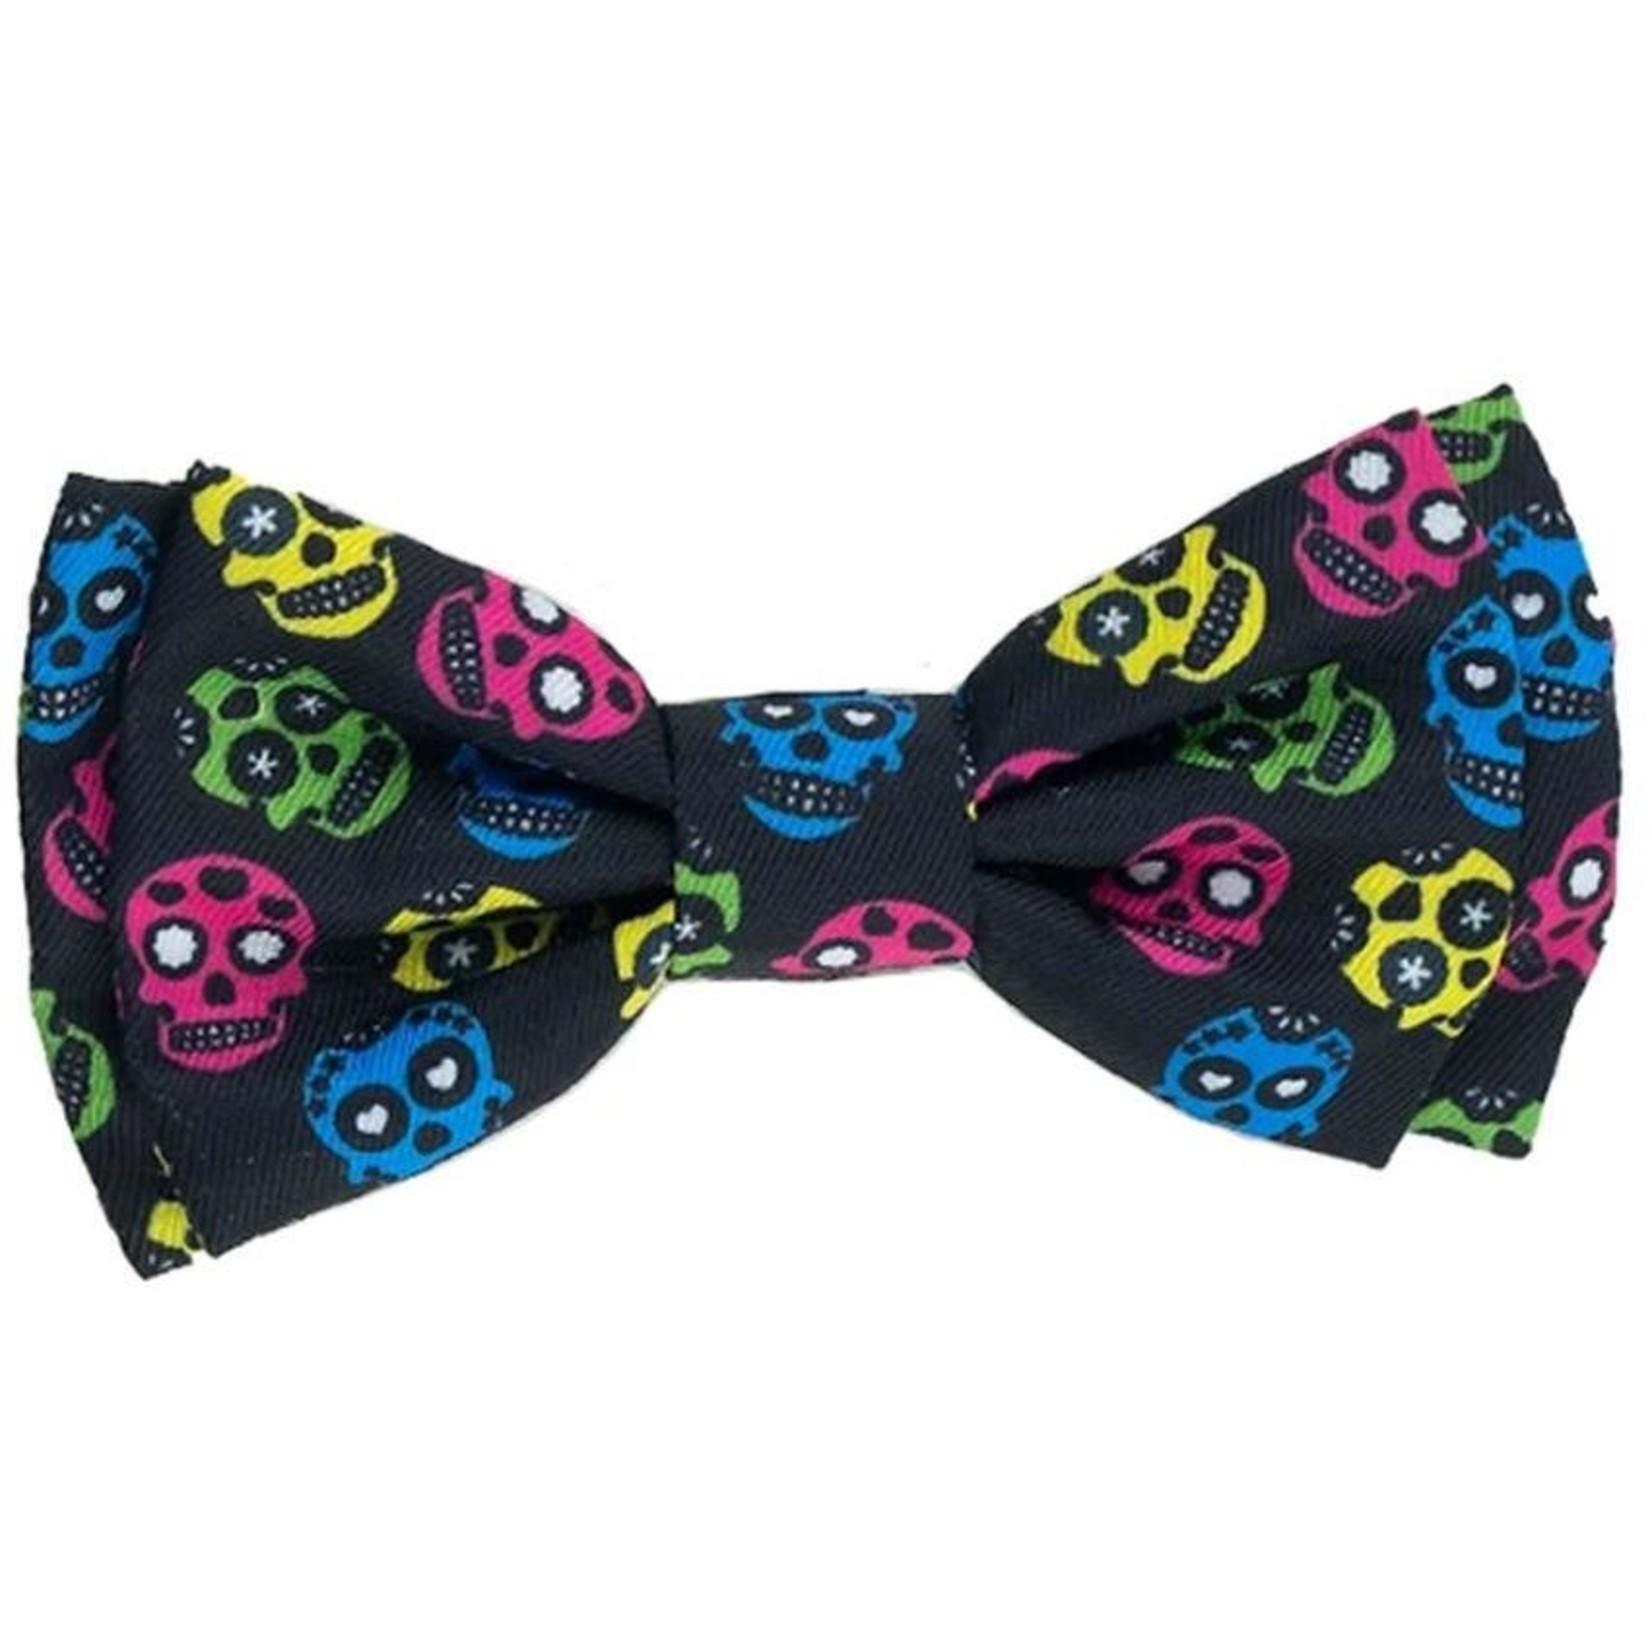 Huxley & Kent H&K Sugar Skull Bow Tie